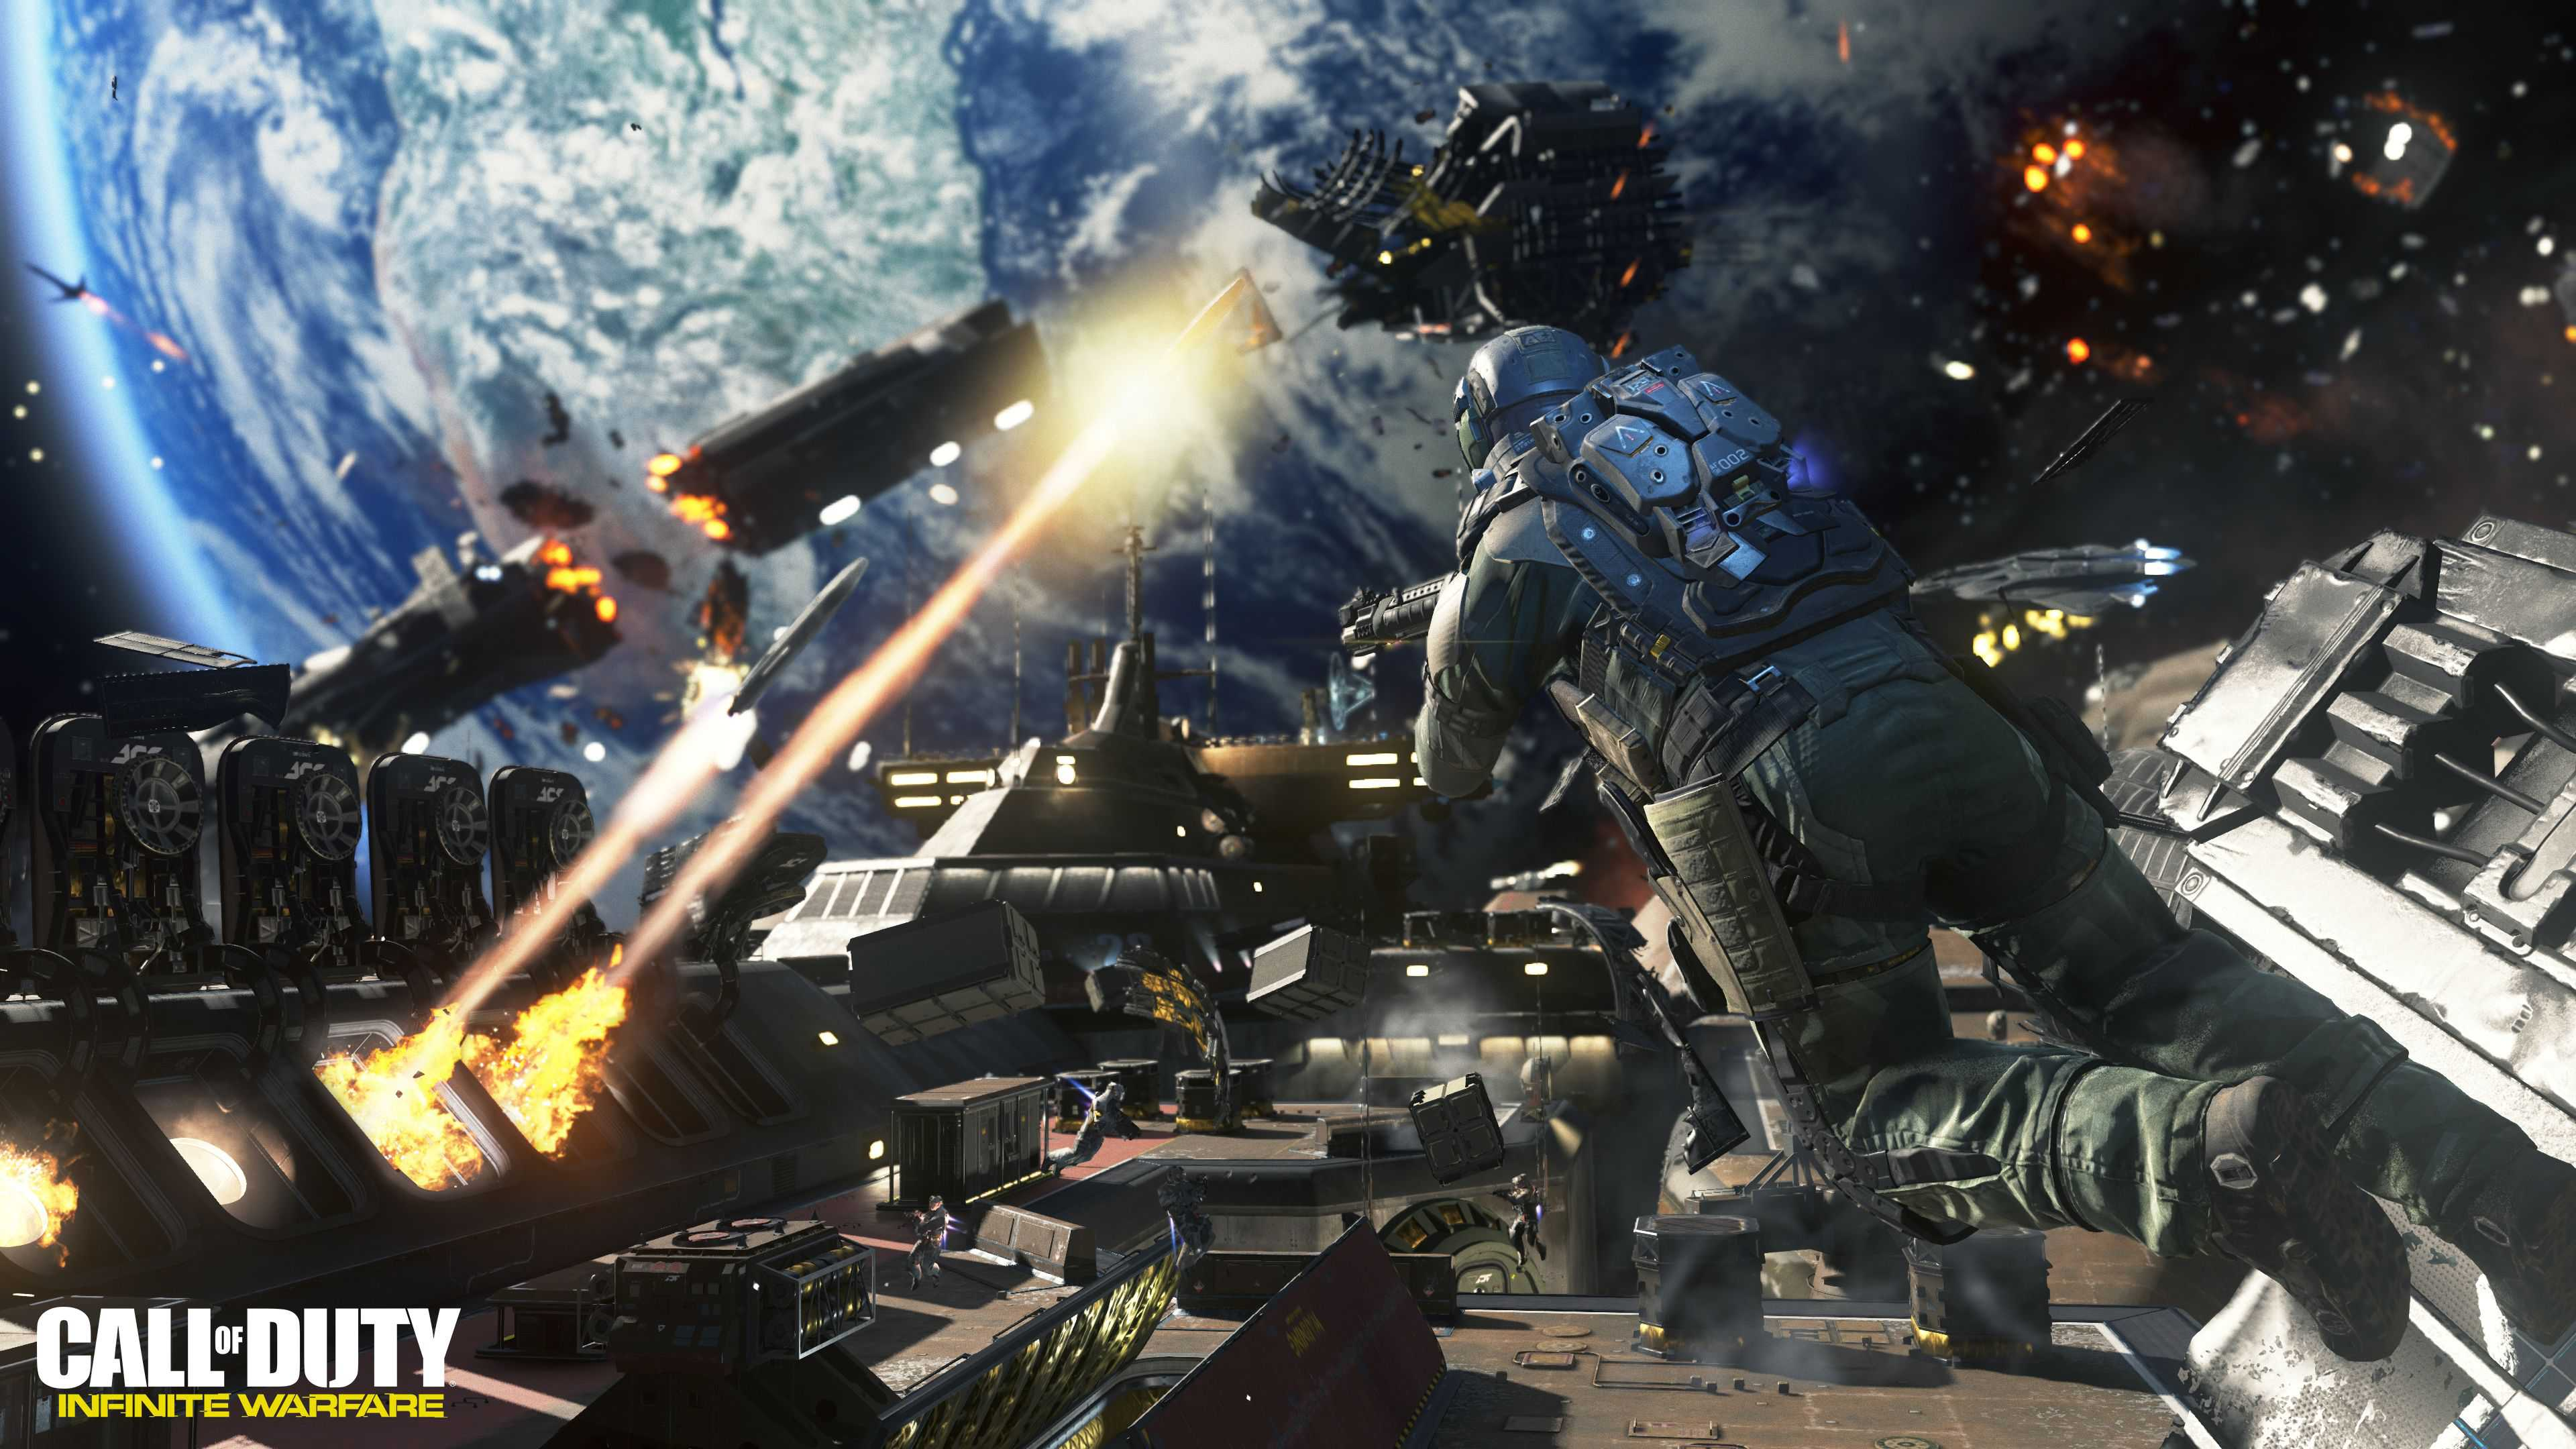 Call Of Duty Infinite Warfare 4k Ultra HD Wallpaper Background 3840x2160